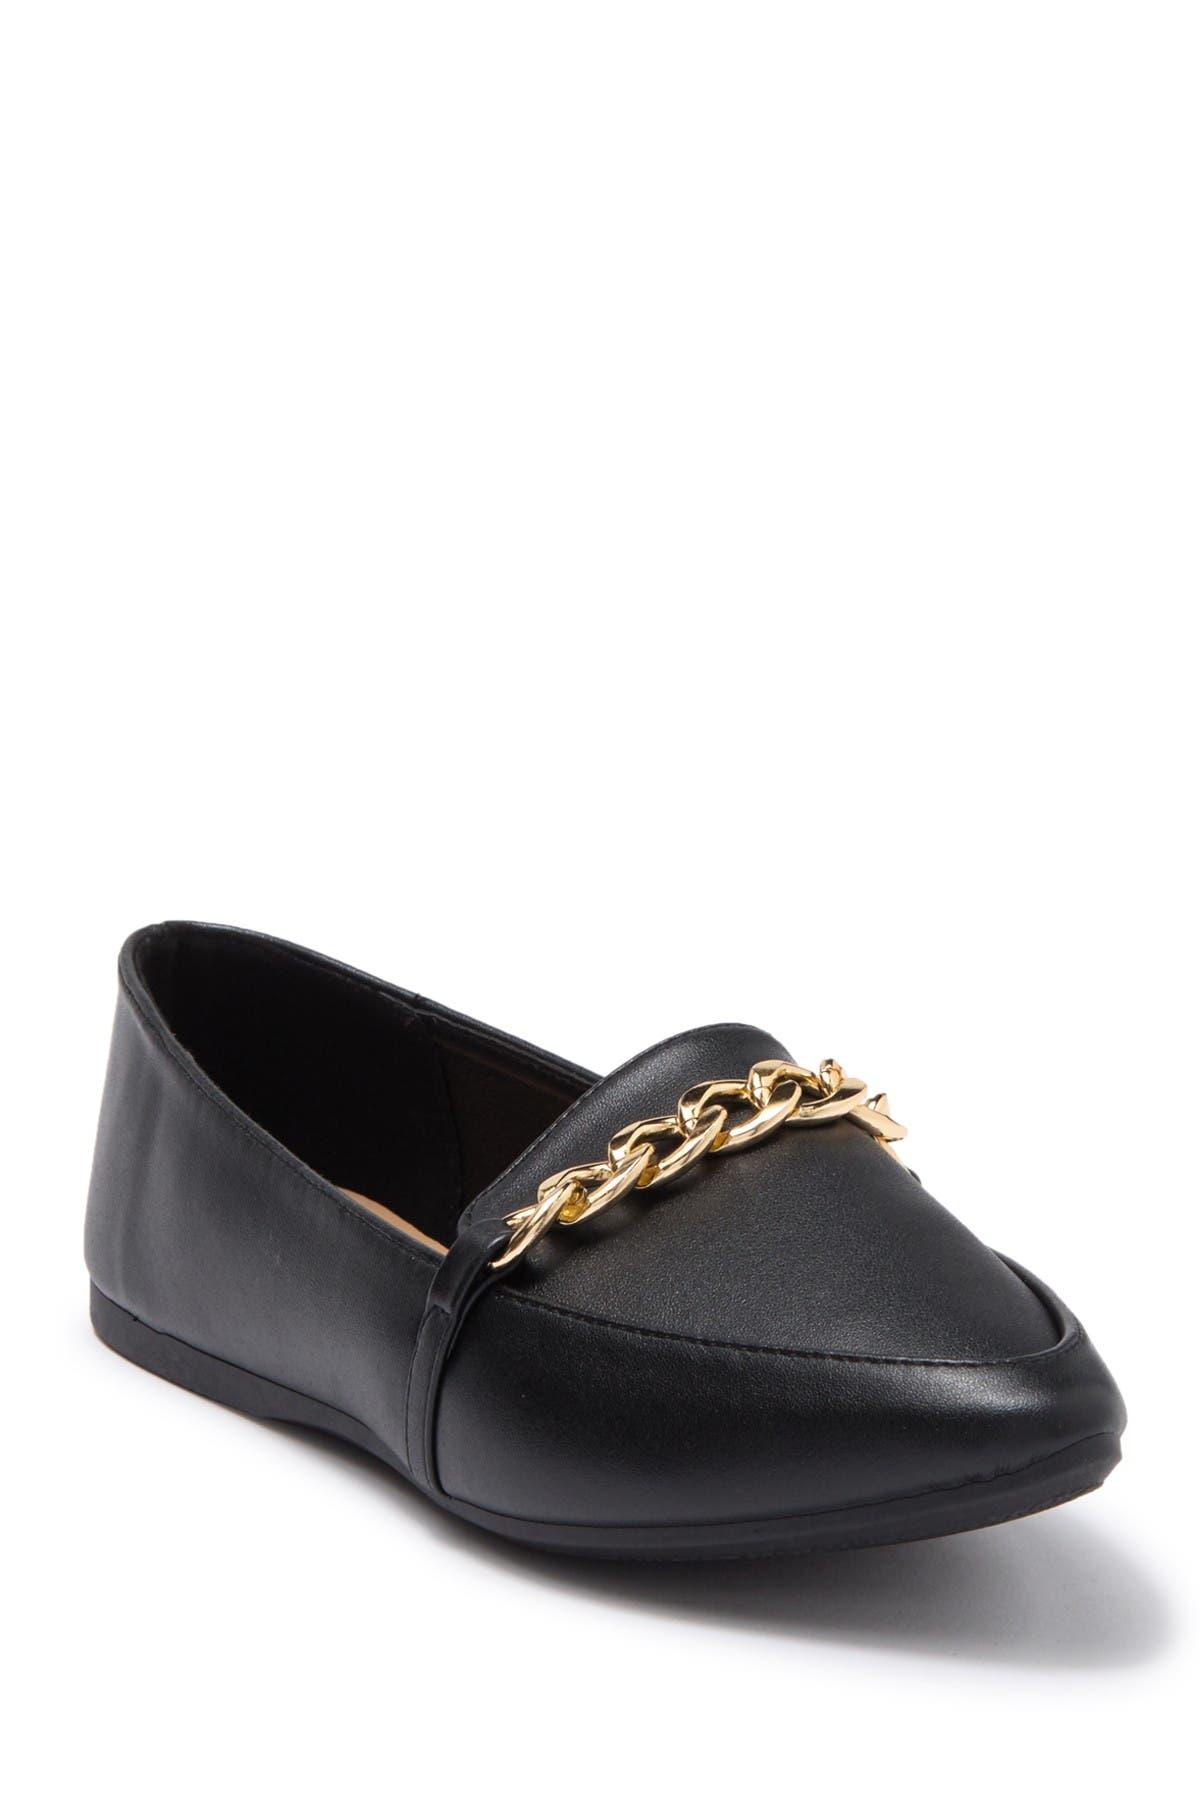 Image of Top Moda Scott Metal Bit Pointed Toe Loafer